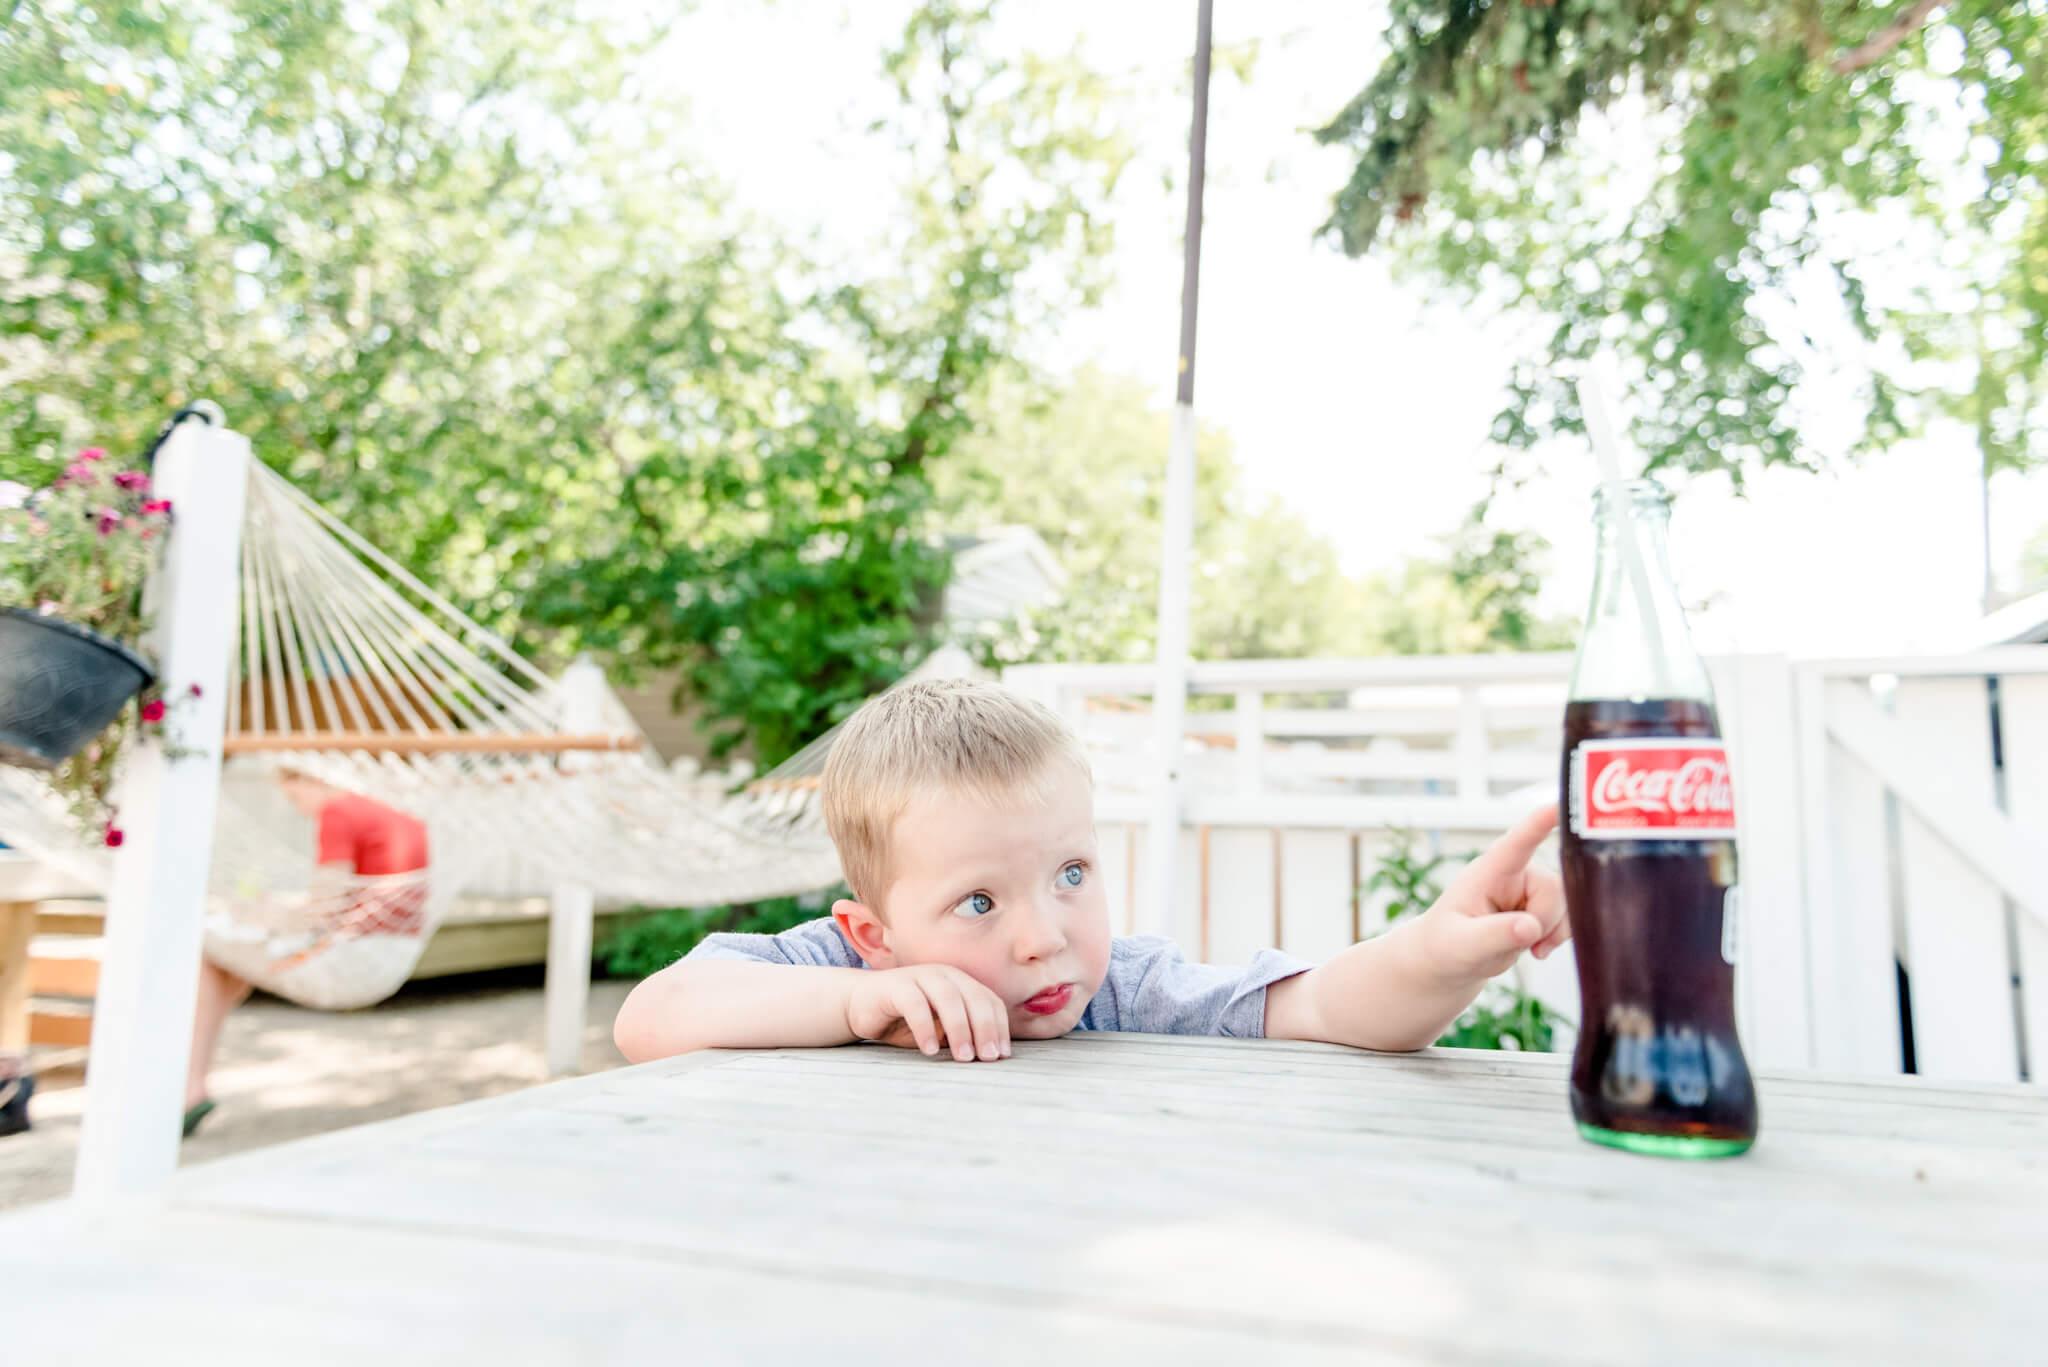 Little boy drinking glass bottle Coca-Cola